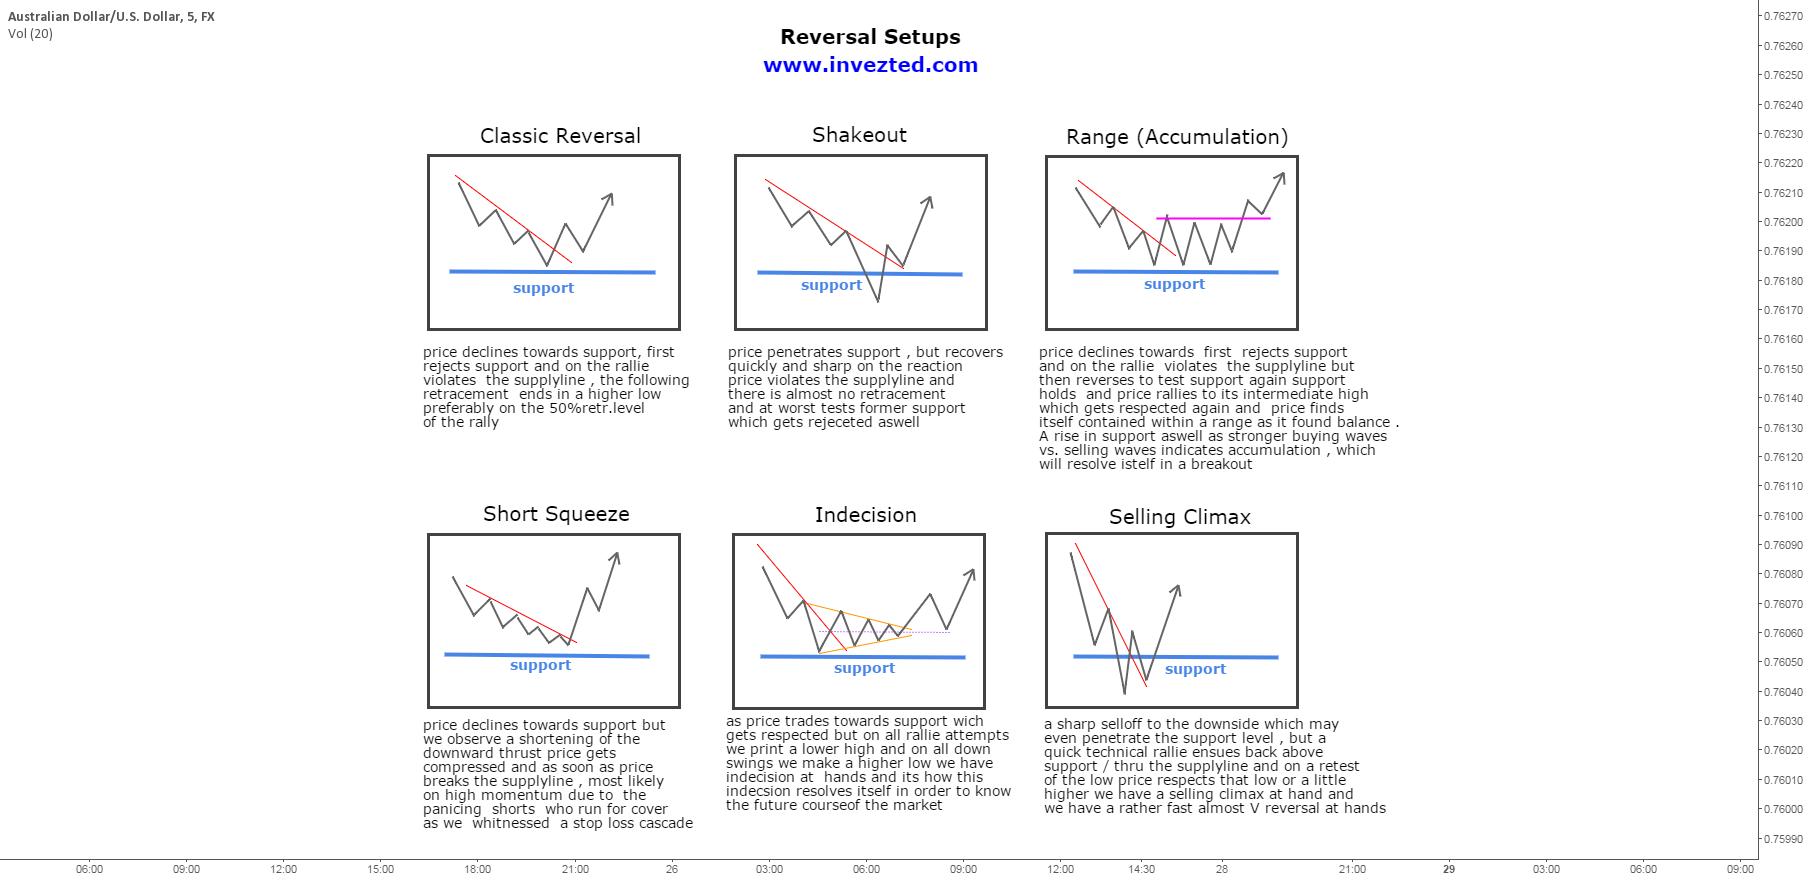 $Study : Reversal Setups